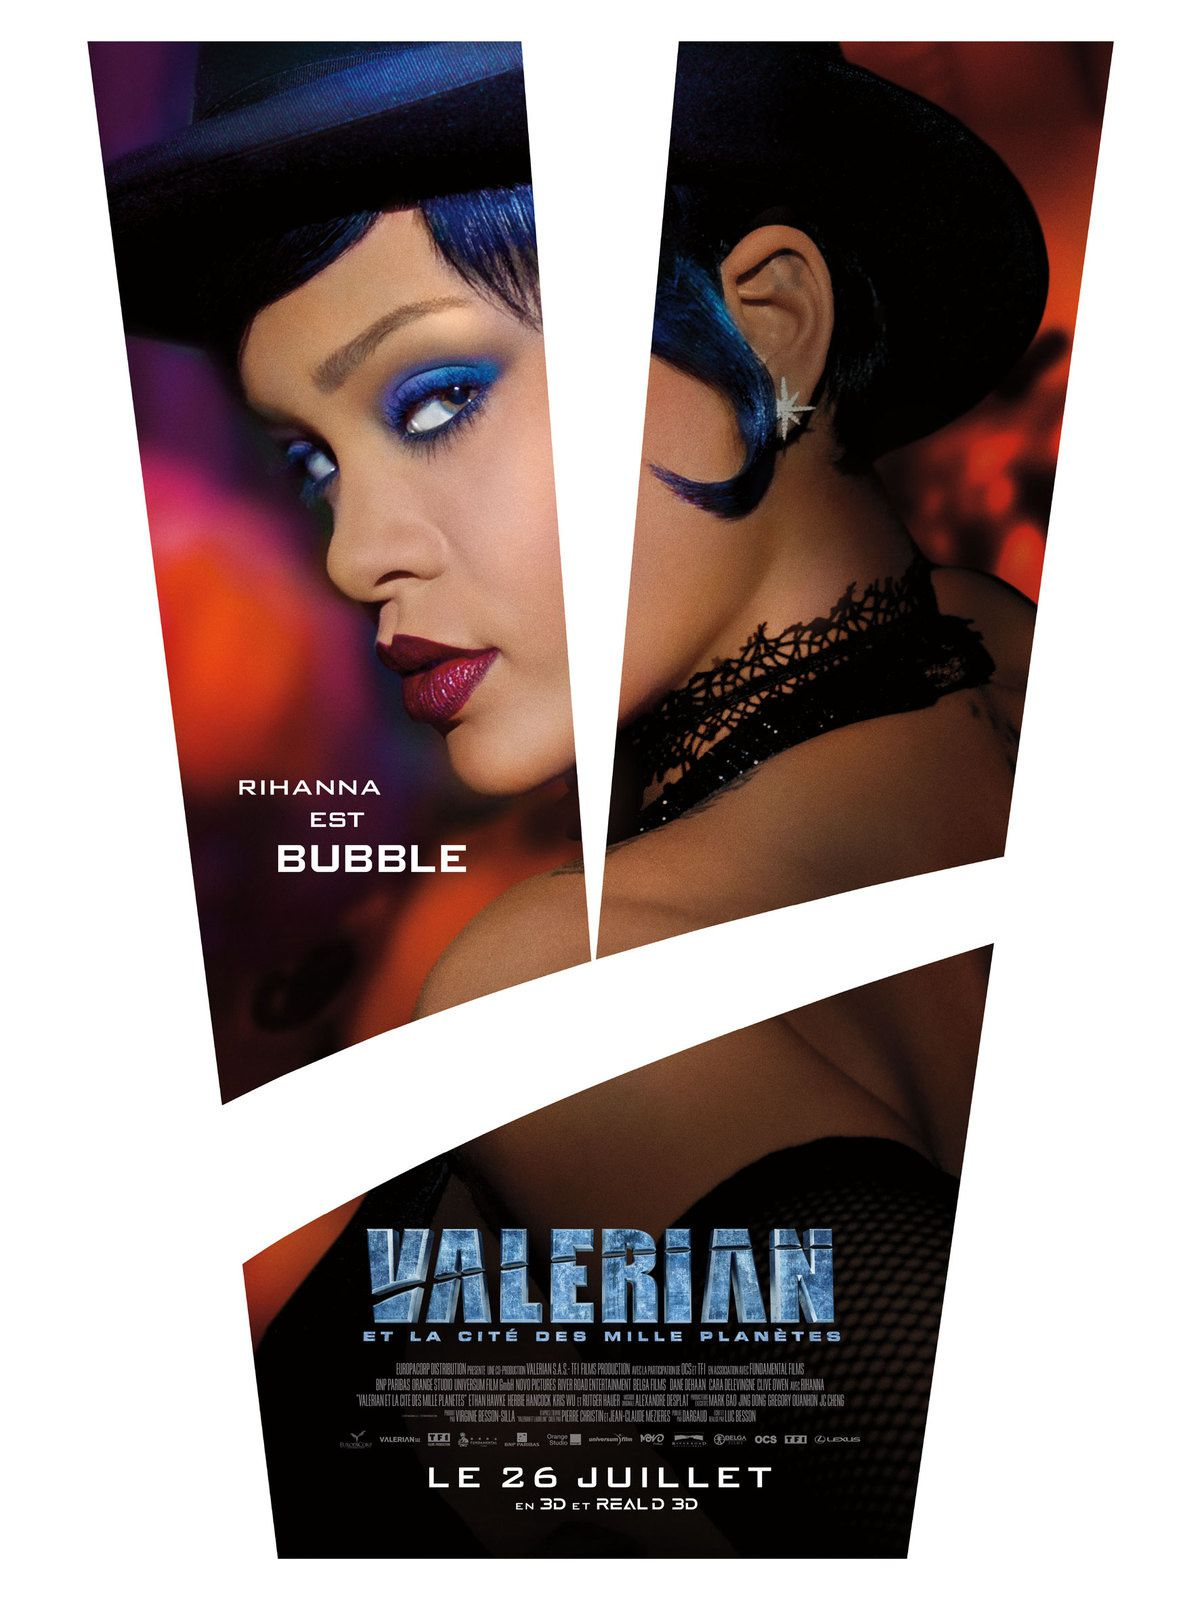 Nouveau teaser vidéo du film Valérian, avec Rihanna.